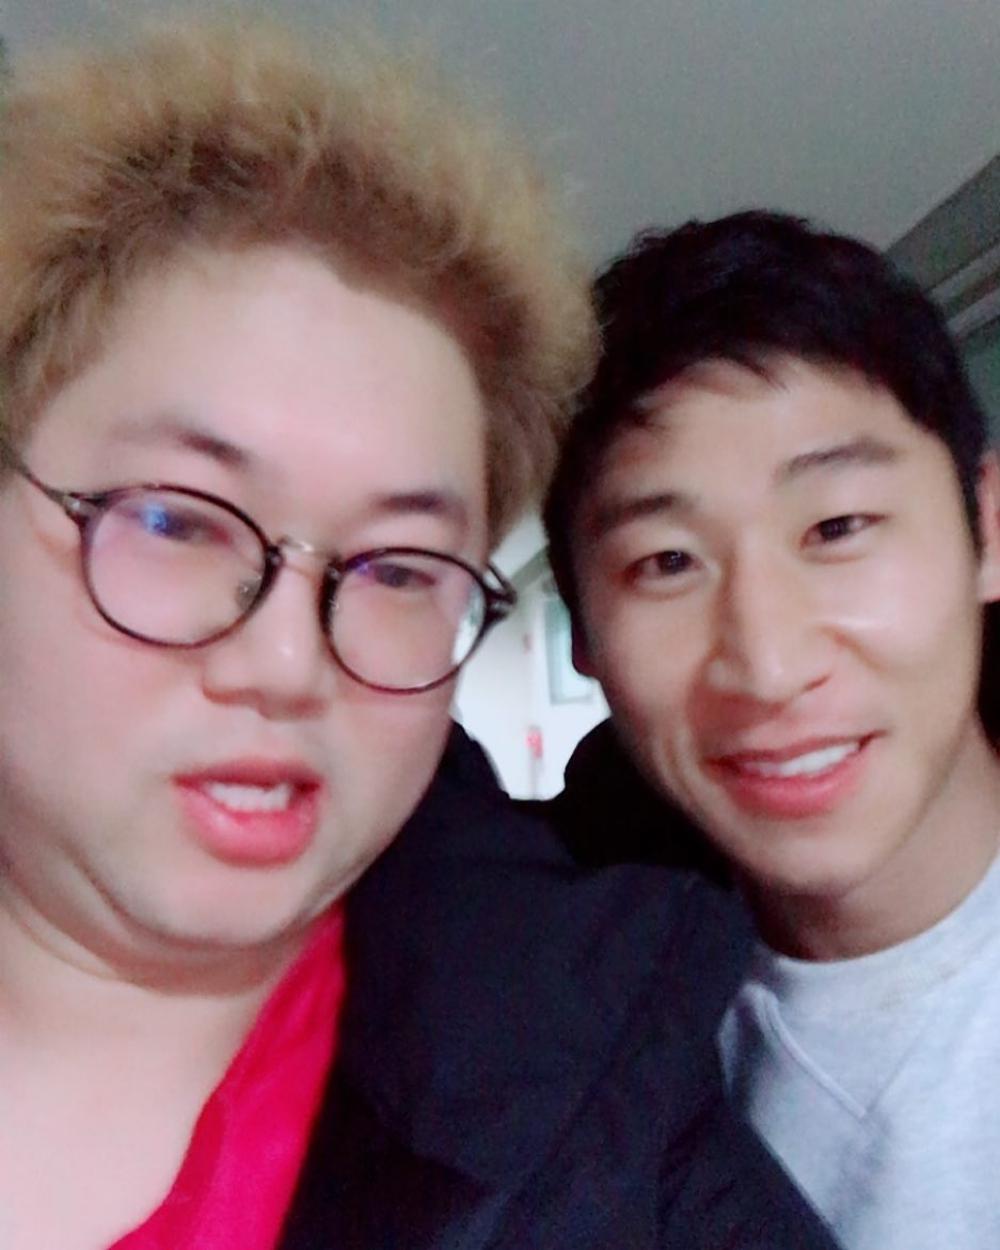 'K리그 홍보대사' 아프리카TV BJ 감스트, 이근호와 투샷 눈길